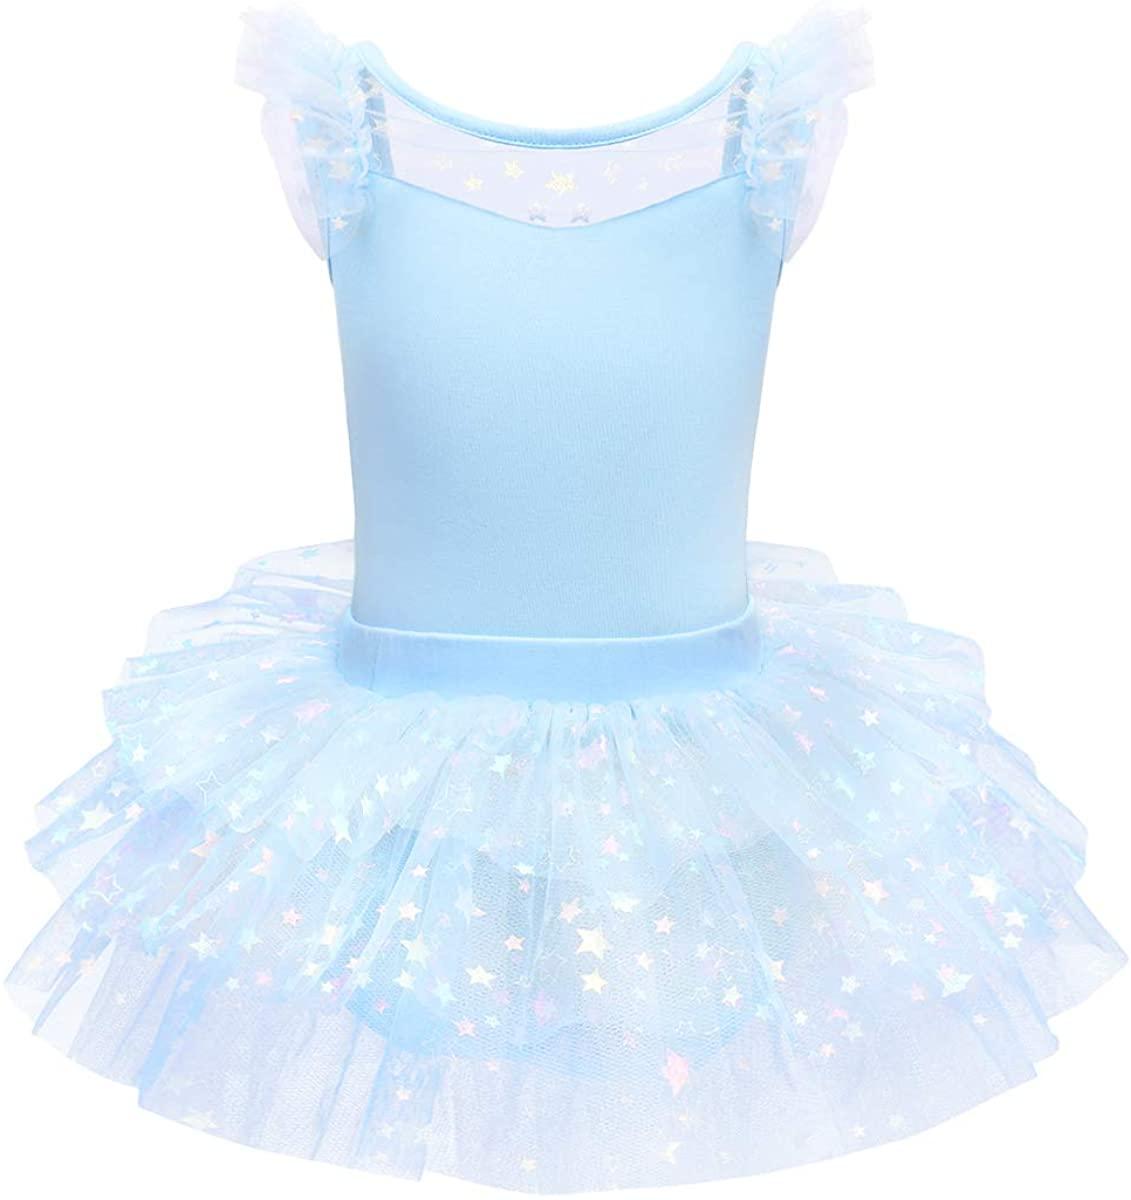 IDOPIP Girls Glitter Star Tutu Skirted Leotard Sequin Ruffle Sleeve Ballet Dance Dress Ballerina Dancewear Gymnastics Costume